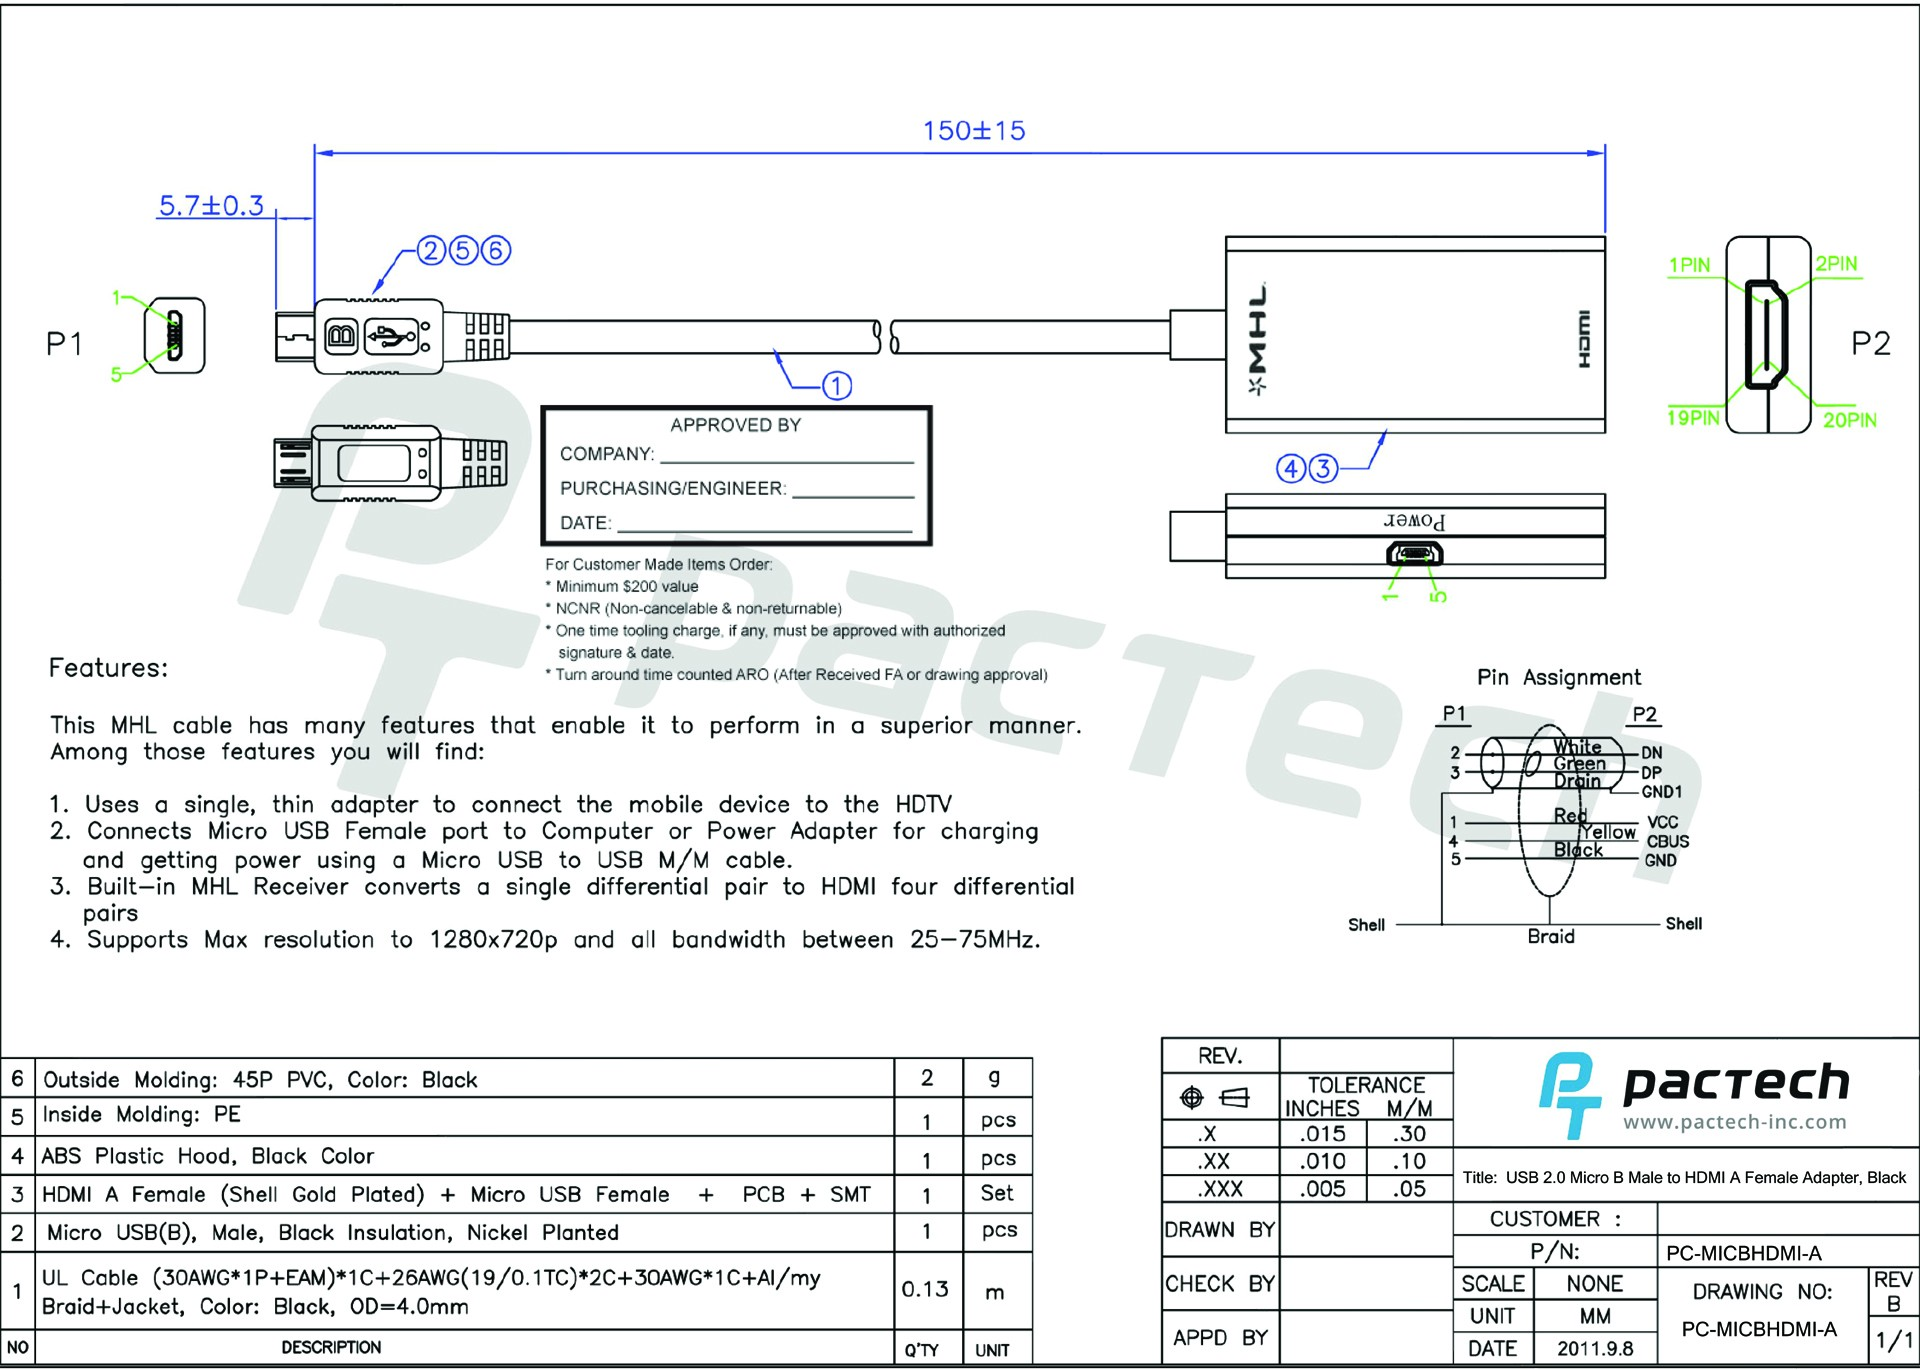 Esata/usb 2.0 to Usb 2.0 Wiring Schematic Usb 2 0 Micro B Male to Hdmi A Female Adapter Black Of Esata/usb 2.0 to Usb 2.0 Wiring Schematic